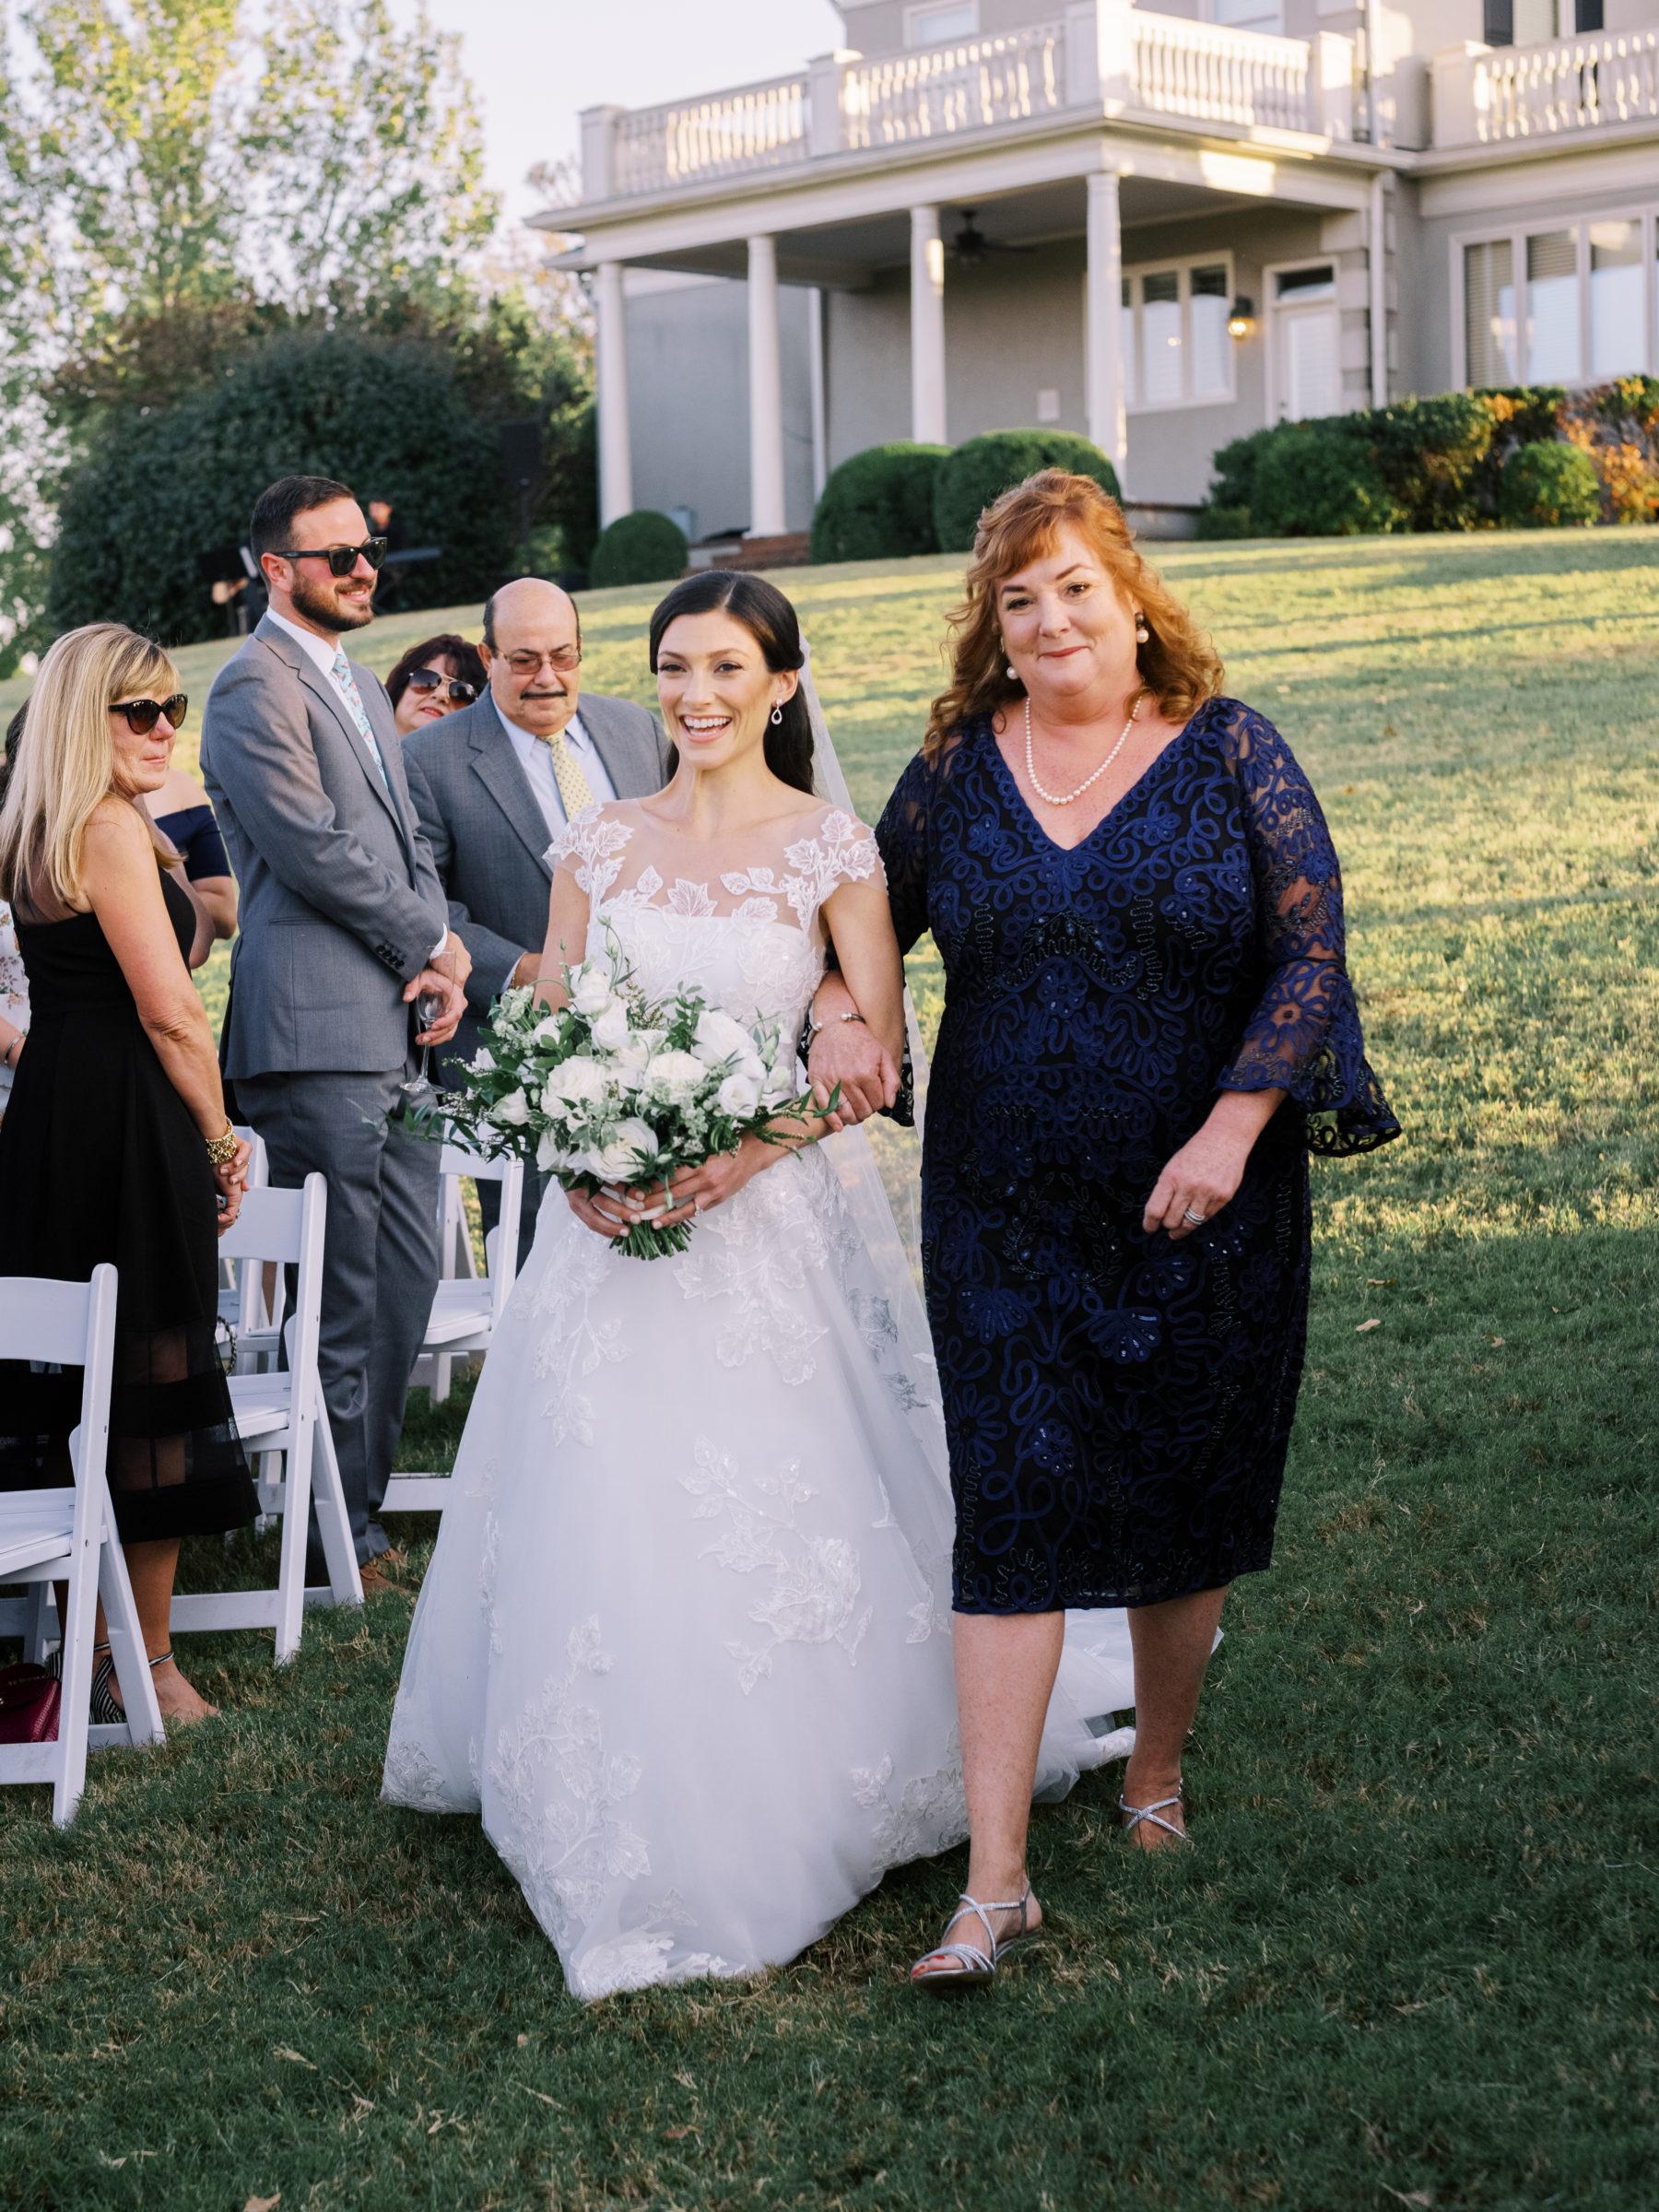 Bride walking down the aisle at Autumn Crest Farm wedding